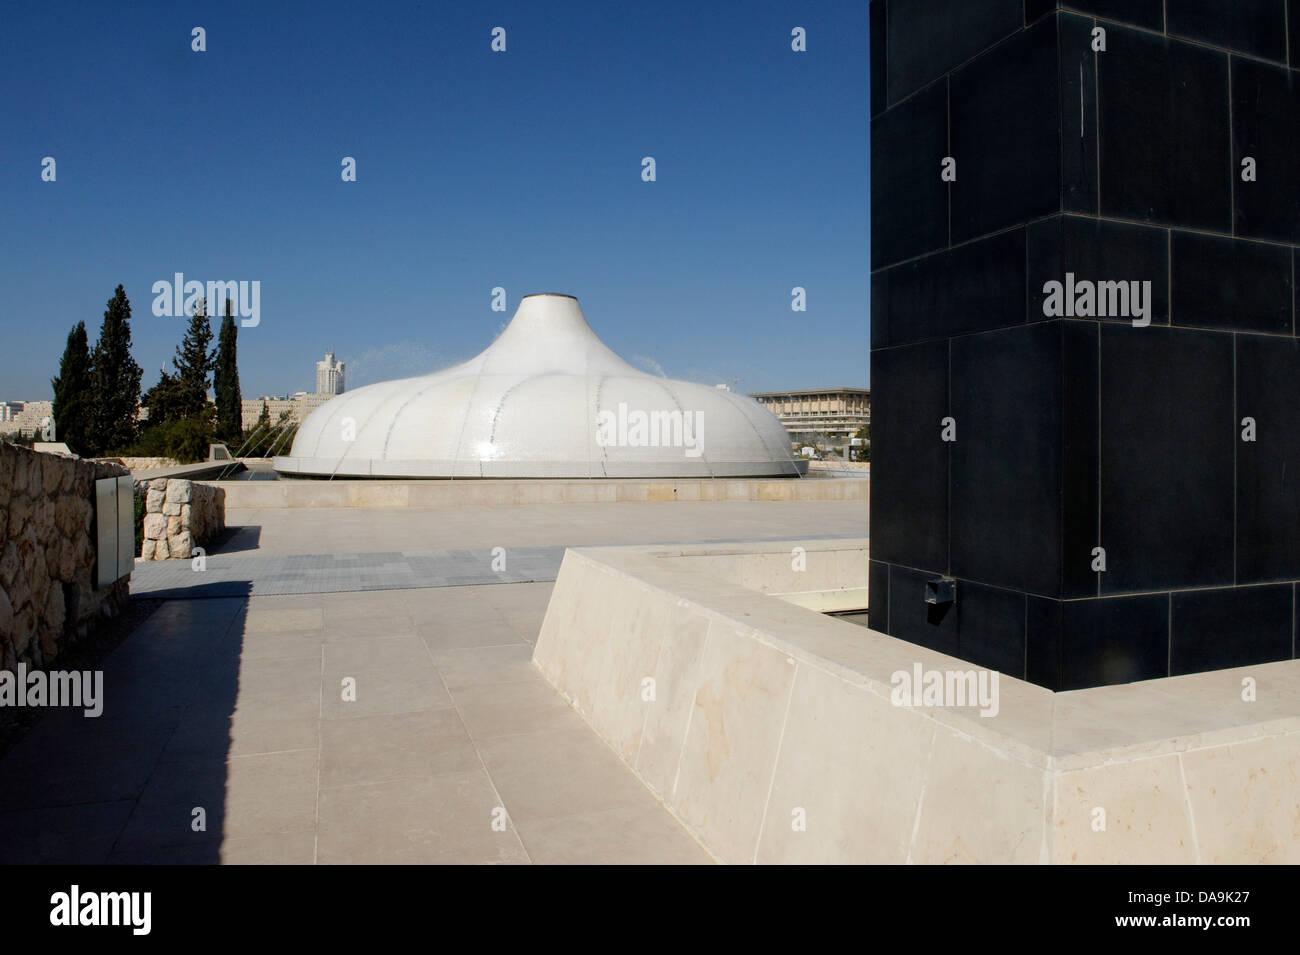 Israel, Israel museum, Jerusalem, Middle East, Near East, dead sea scrolls, rolls, shrine of the book, book, shrine, Stock Photo